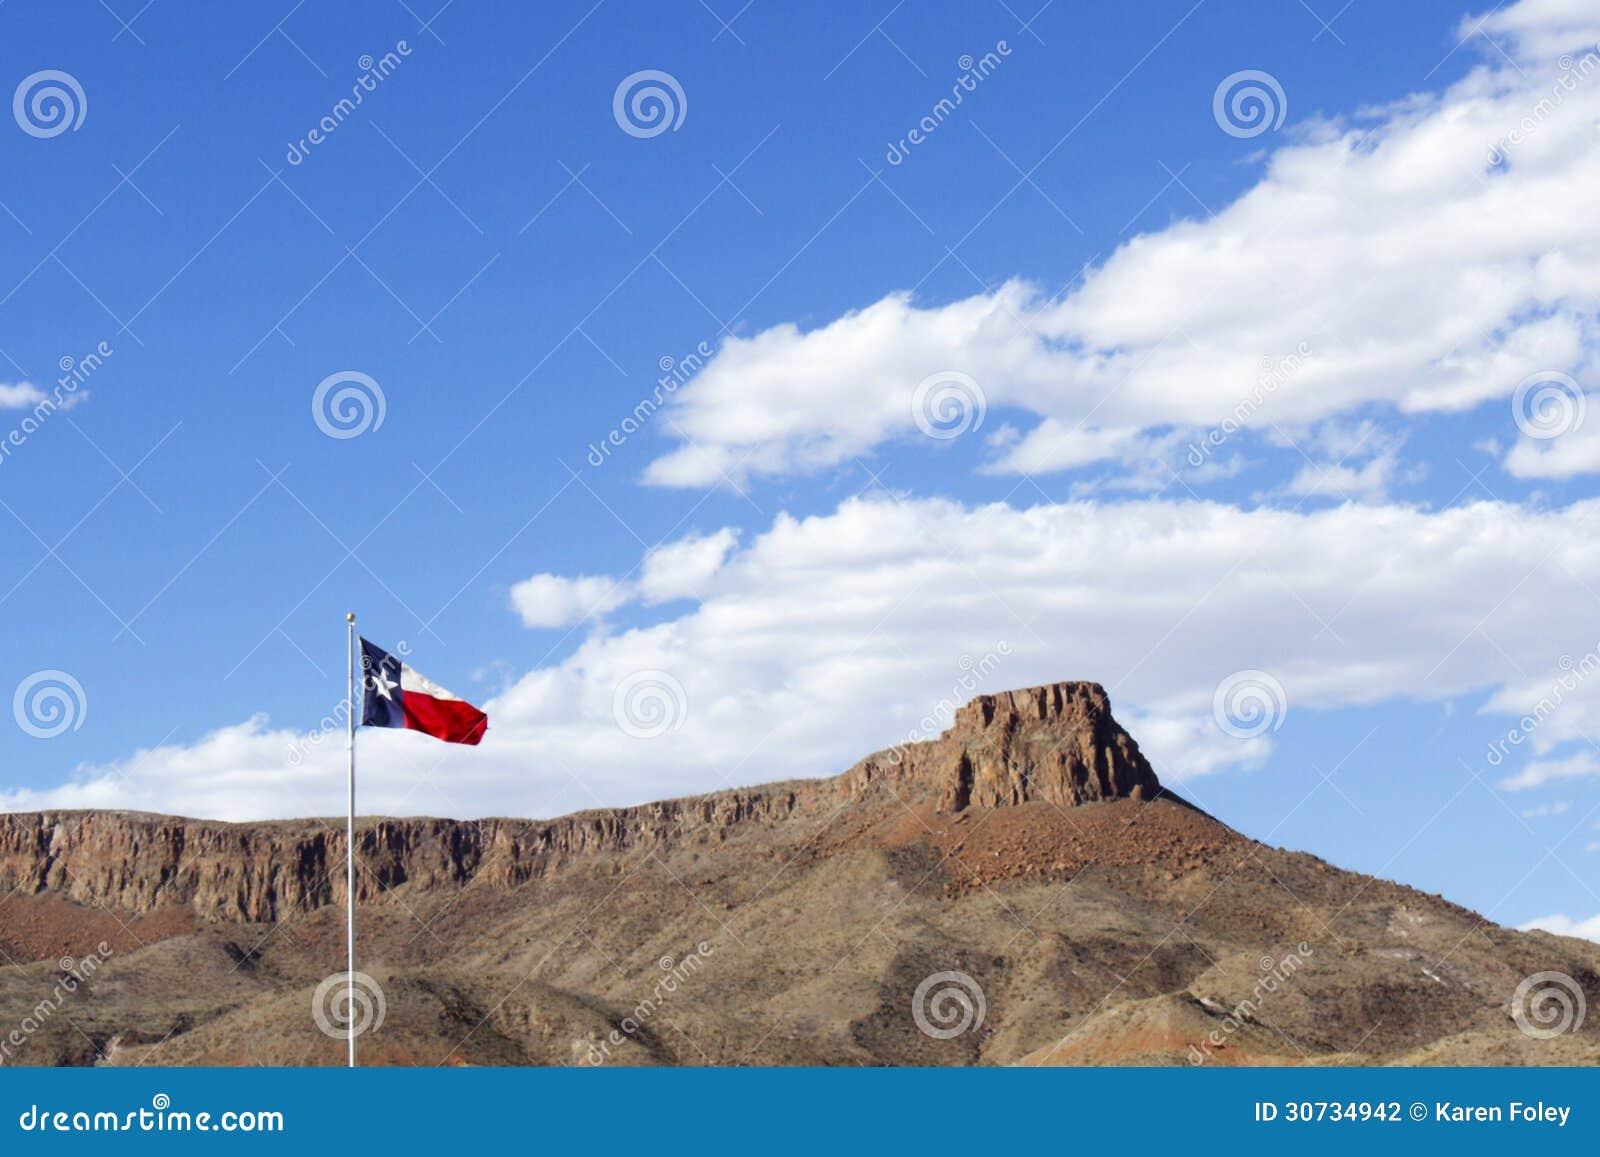 Texas State Flag tegen Blauwe Hemel met Rots Mesa